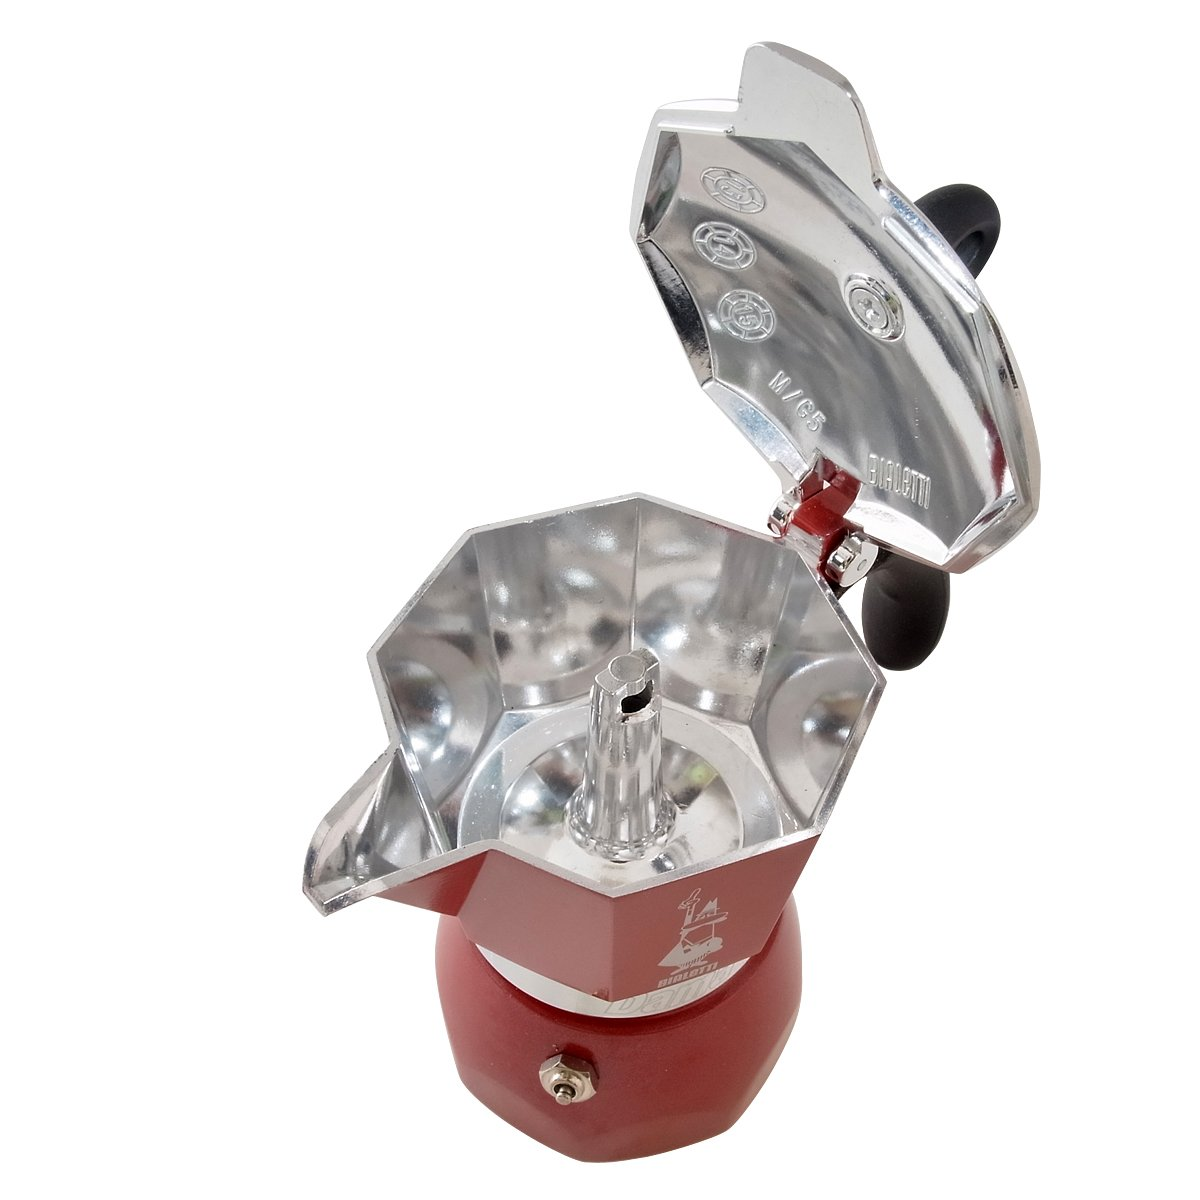 Bialetti: Dama Glamour Espresso Maker - 3 Cups in Red